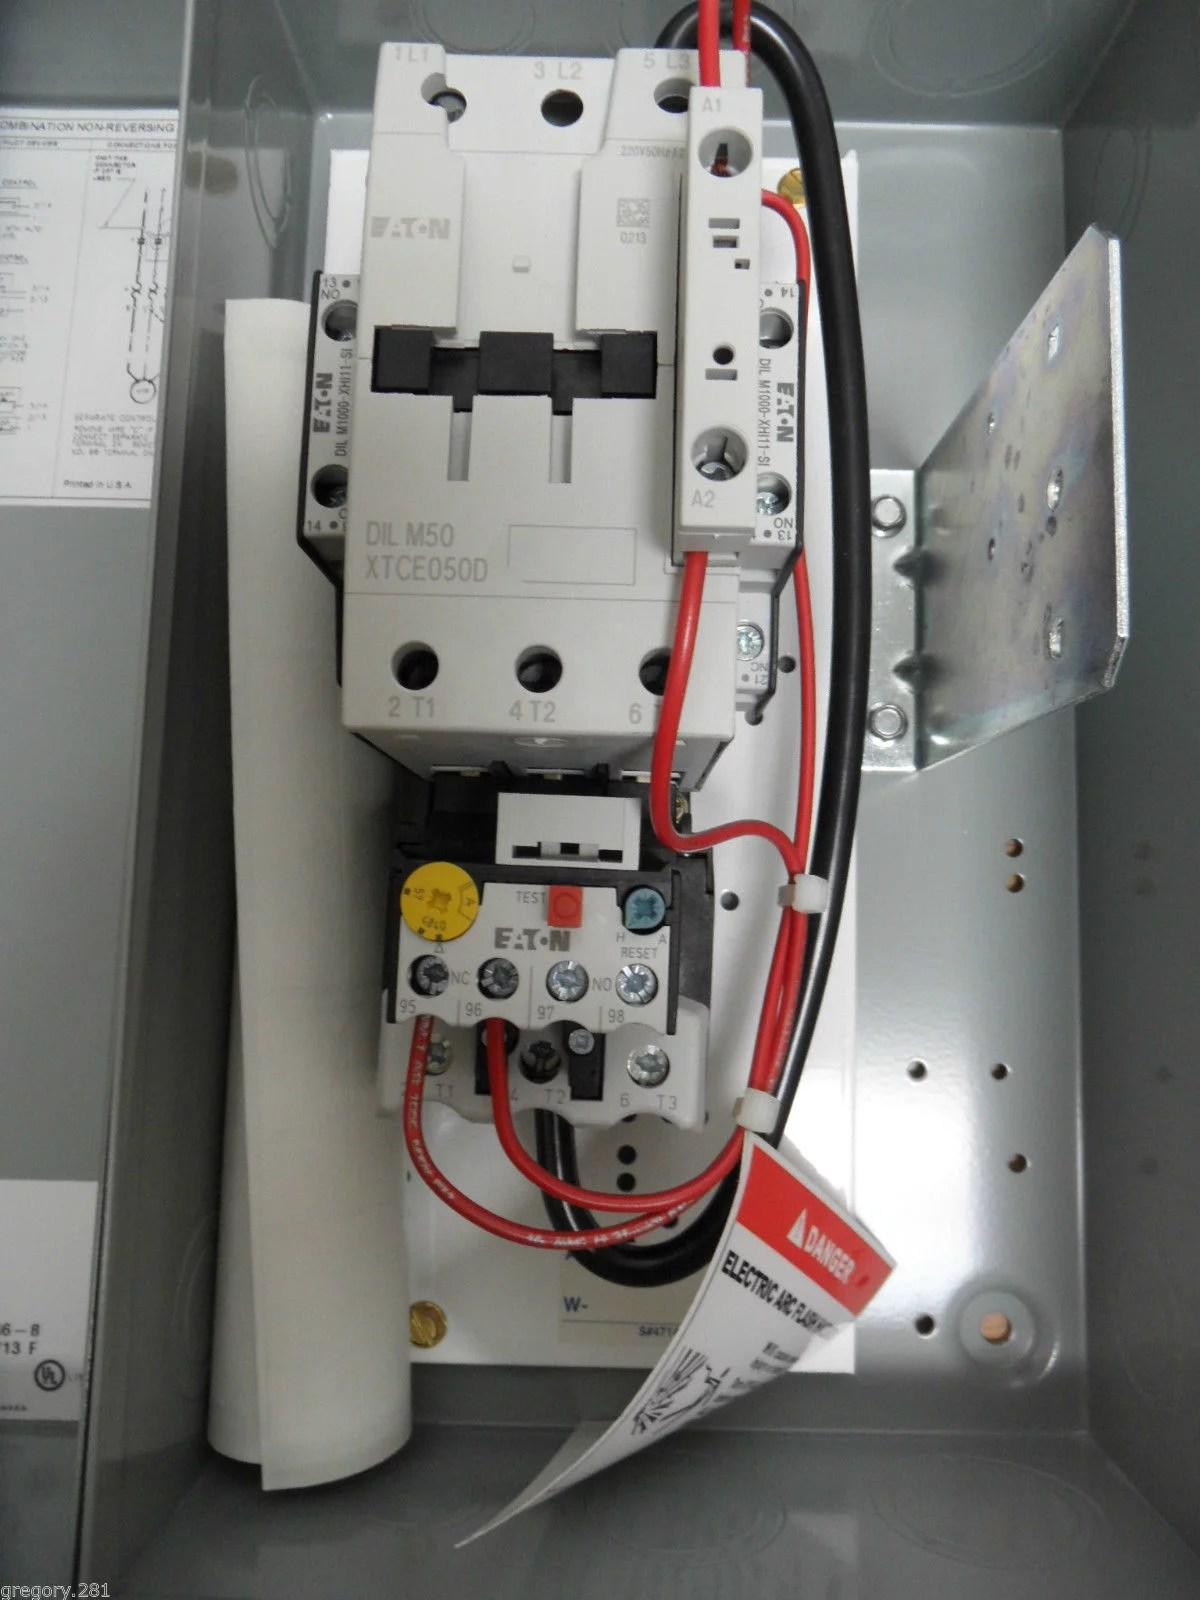 hight resolution of eaton fvnr starter wiring diagram motor soft starter circuitcircuit eaton ecx09k1baa qa27s29 non combination iec fvnr